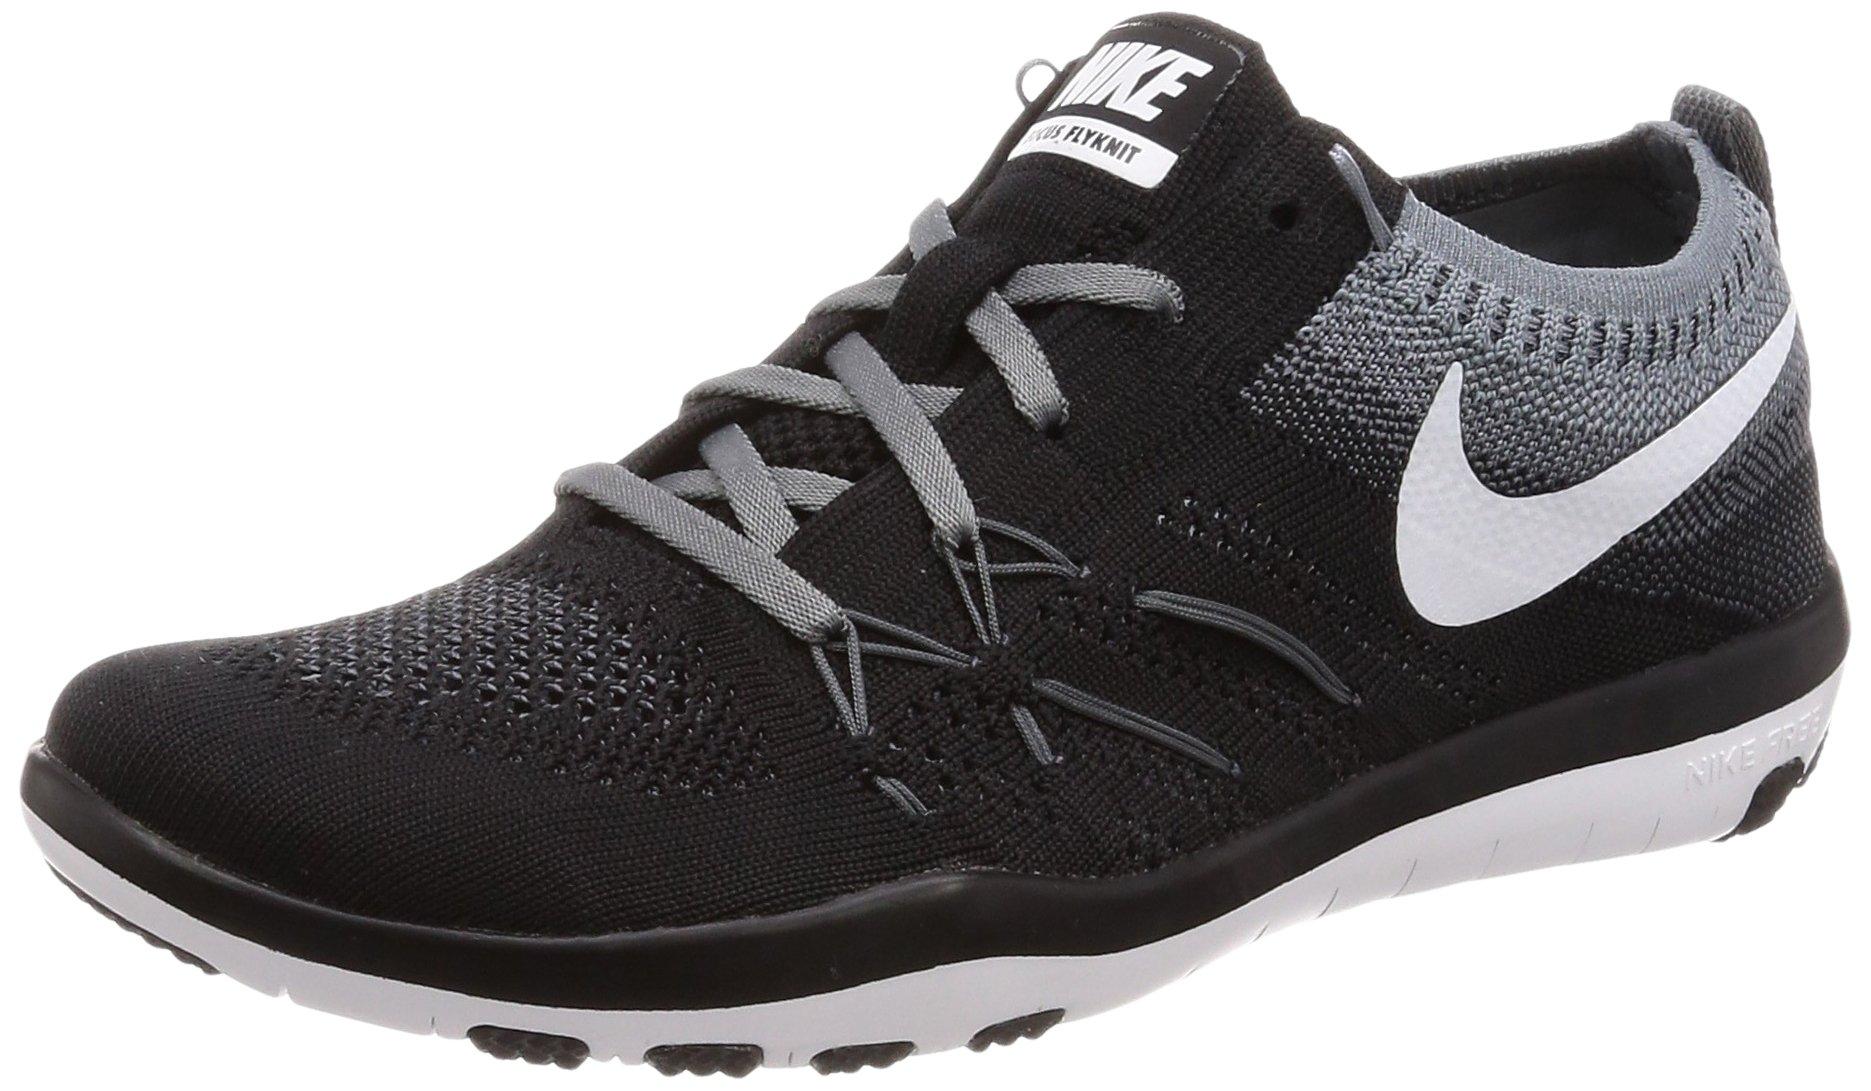 b4a4e291208b Galleon - Nike Women s Free TR Focus Flyknit Black White Grey Running Shoes  Size 7